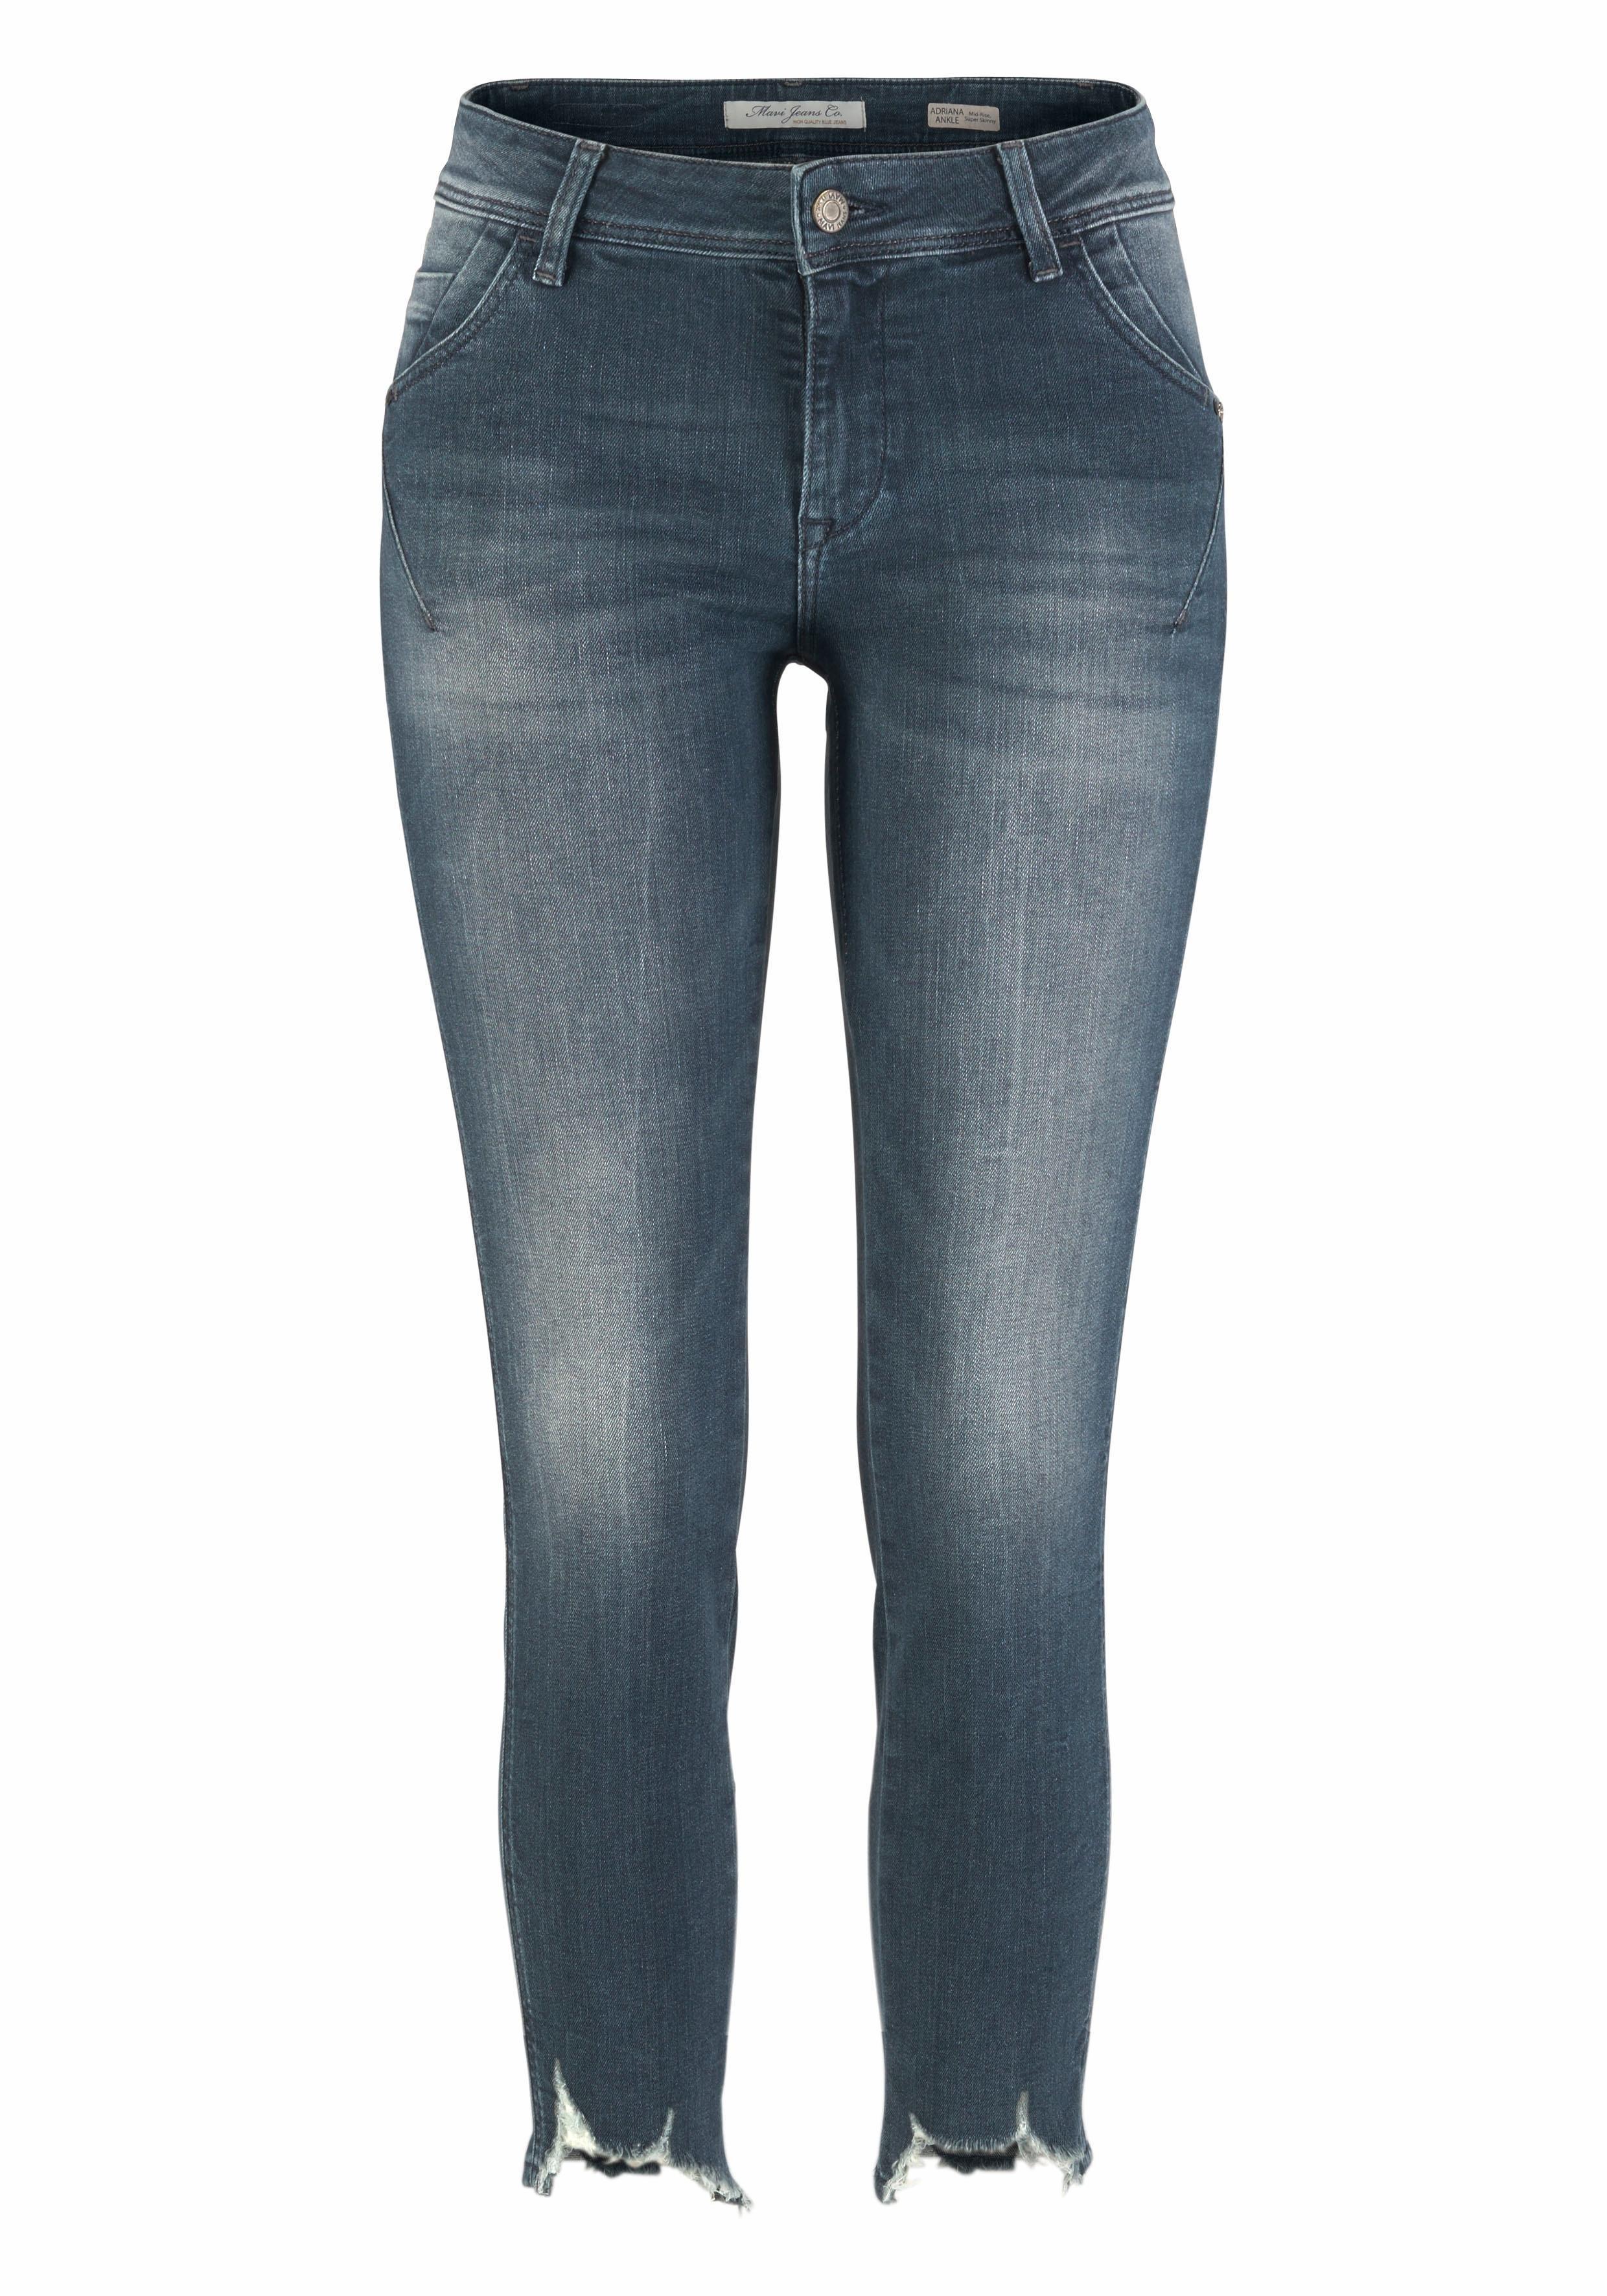 Ankle Jeans Mavi Jeansadriana Online Bij xdoeWrBQC